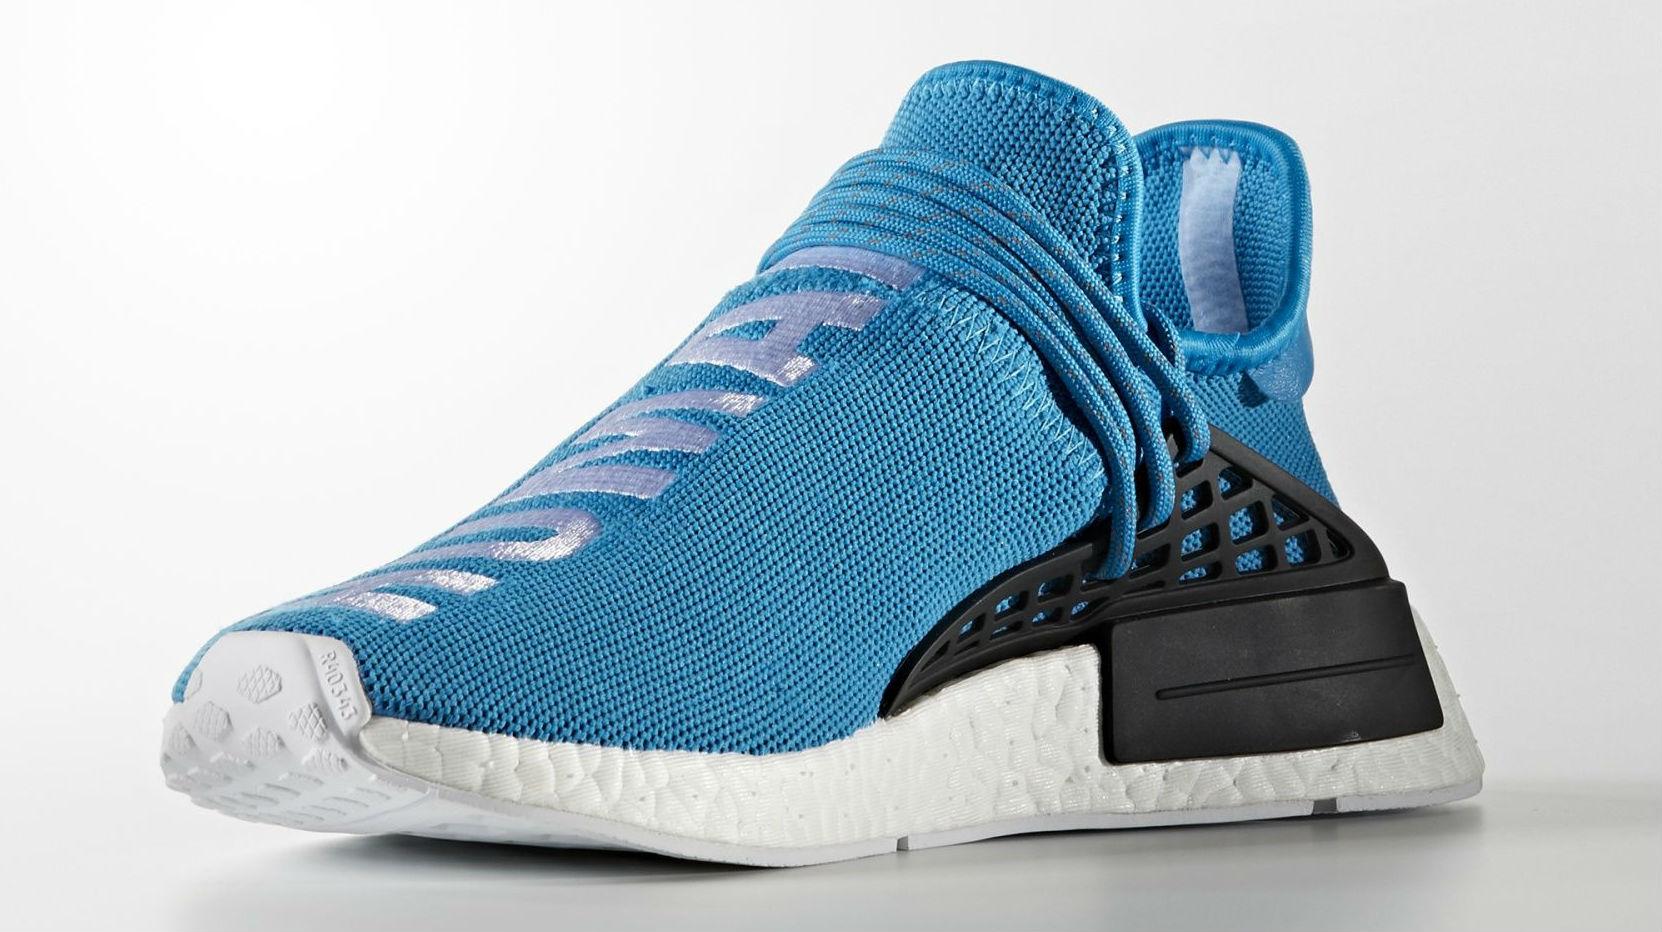 Blue Pharrell adidas NMD Human Race Medial